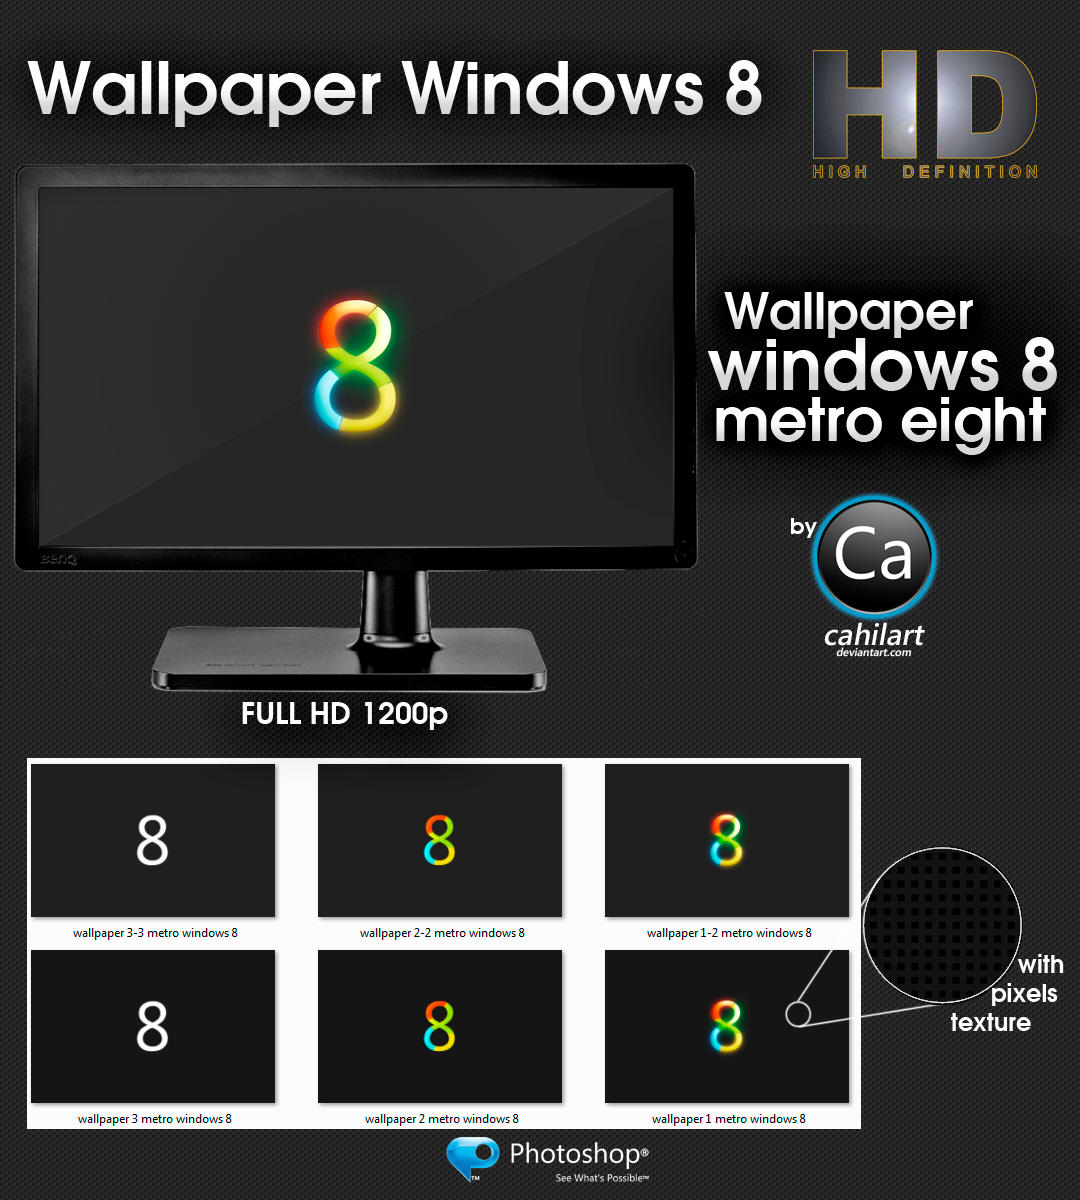 Wallpaper Windows Metro 8 by CaHilART